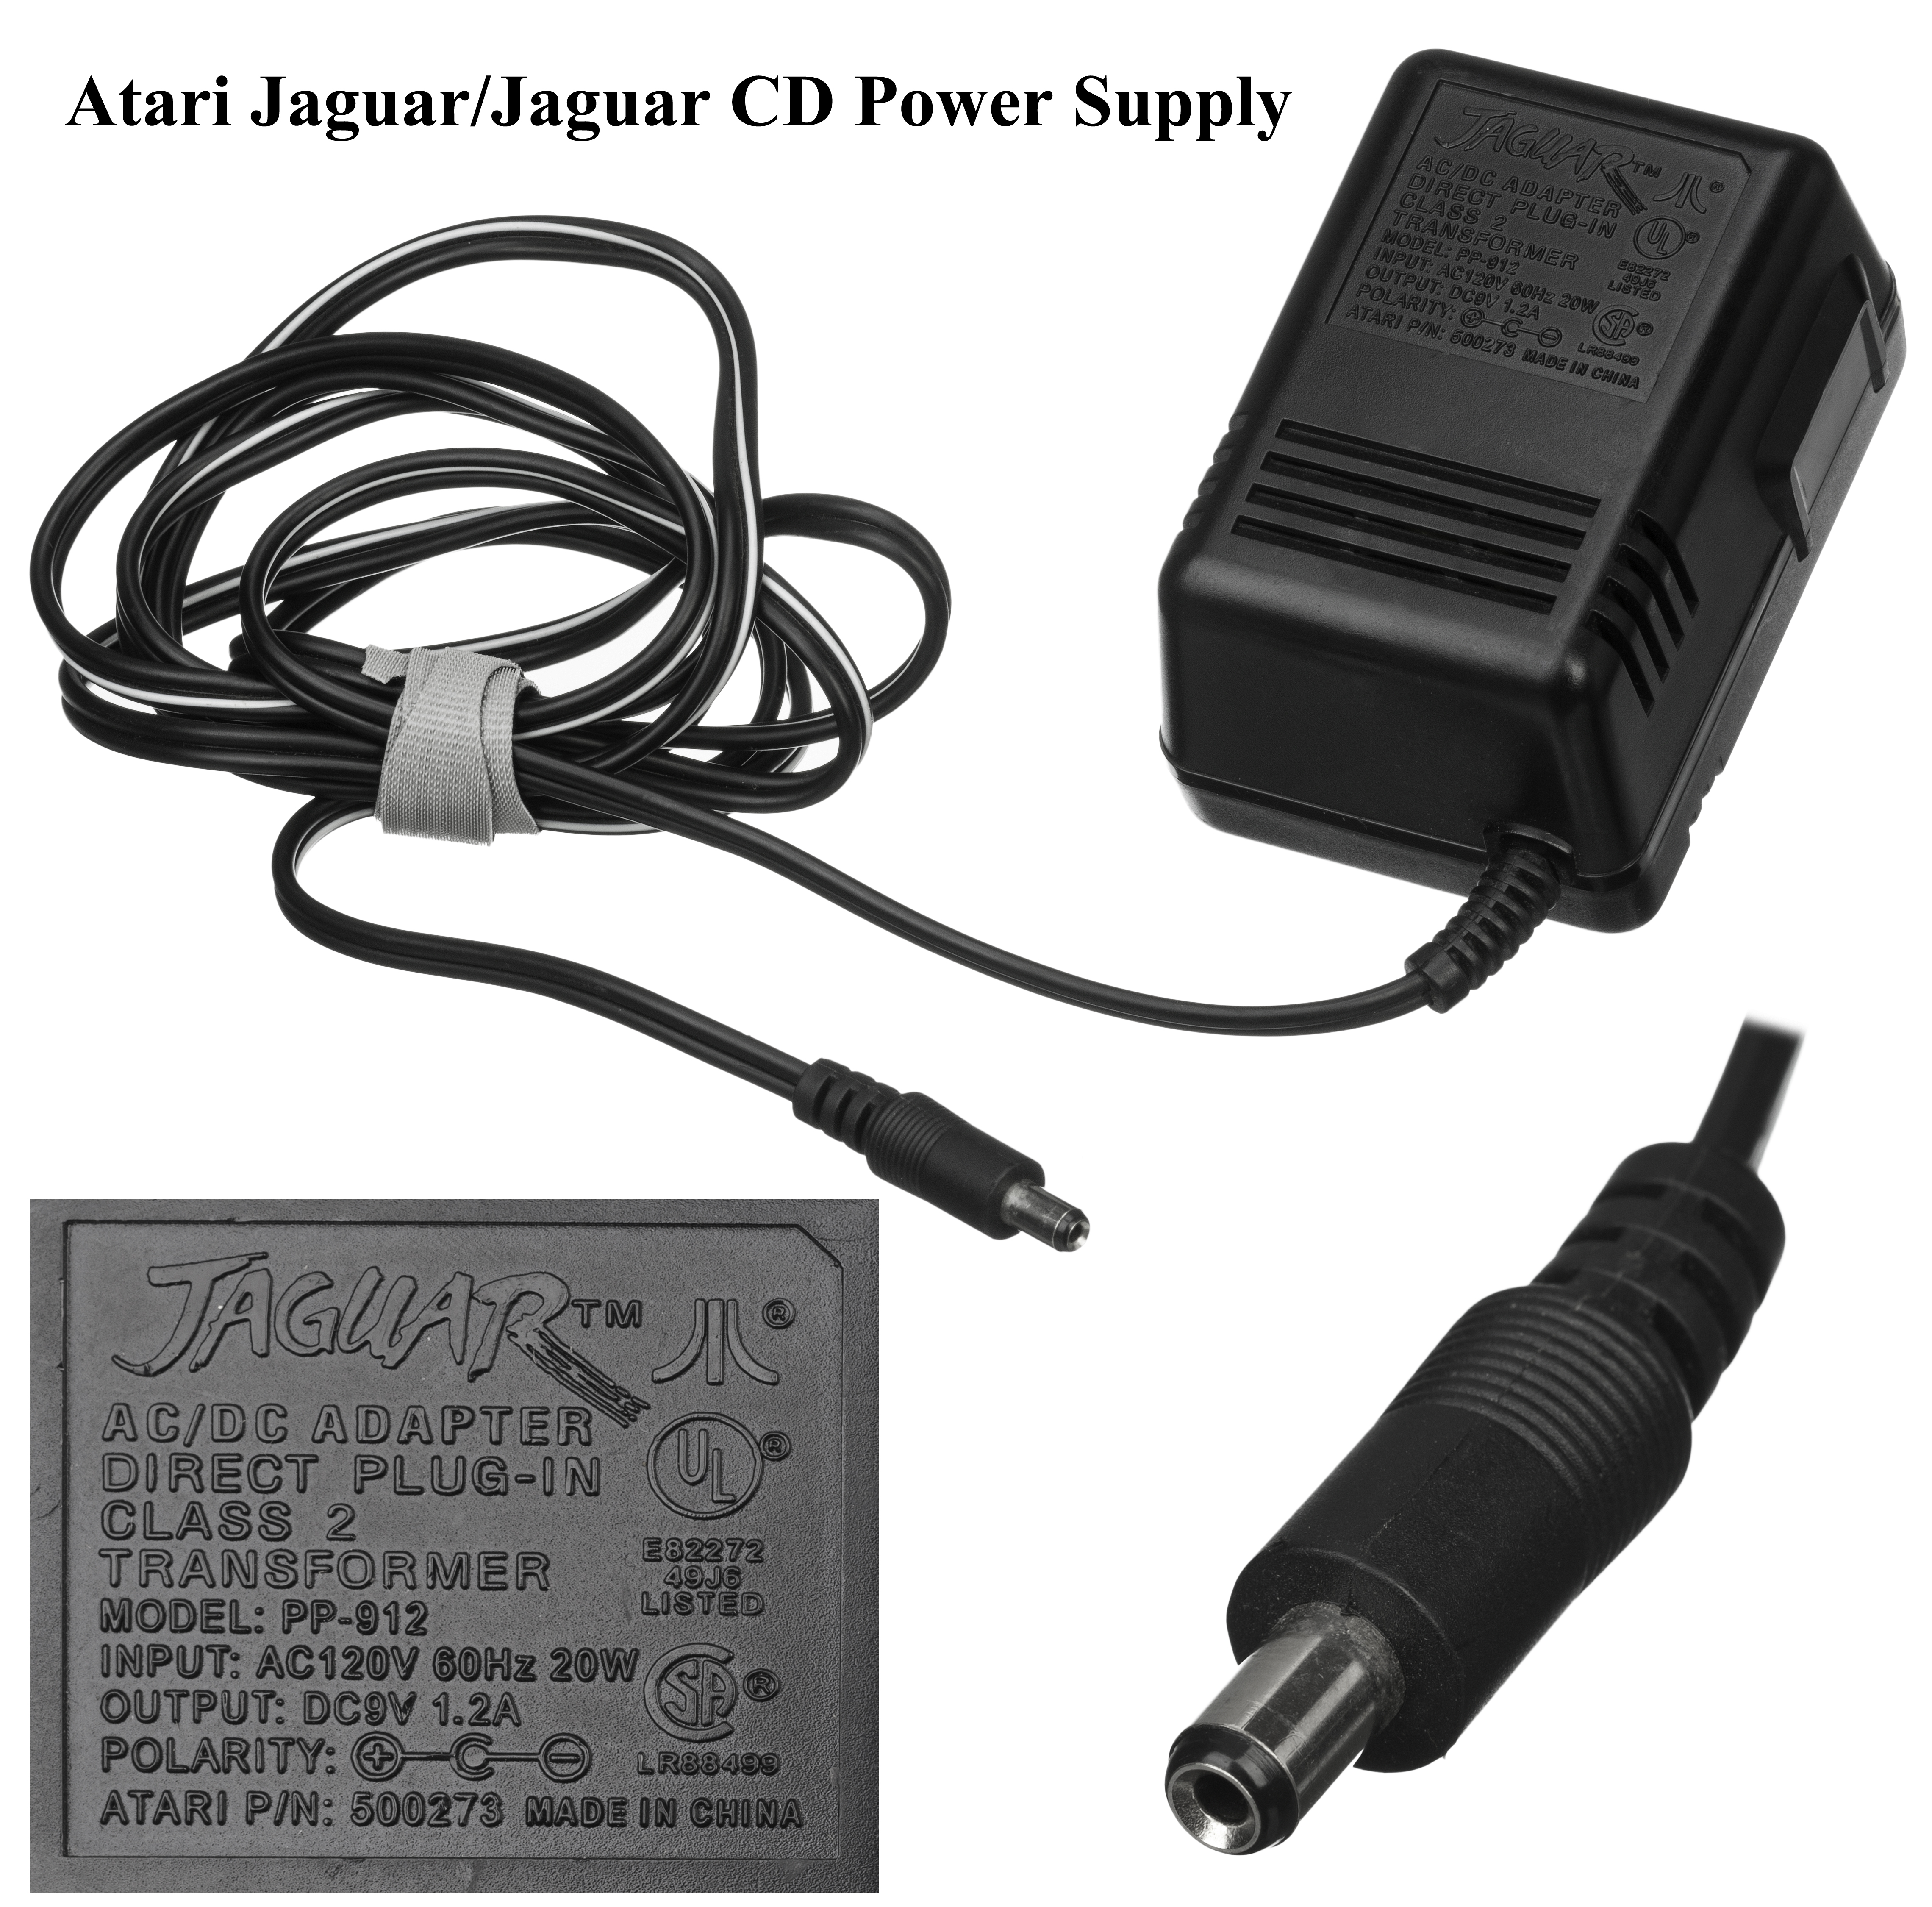 File:Atari-Jaguar-Power-Supply-Type1.jpg - Wikimedia Commons